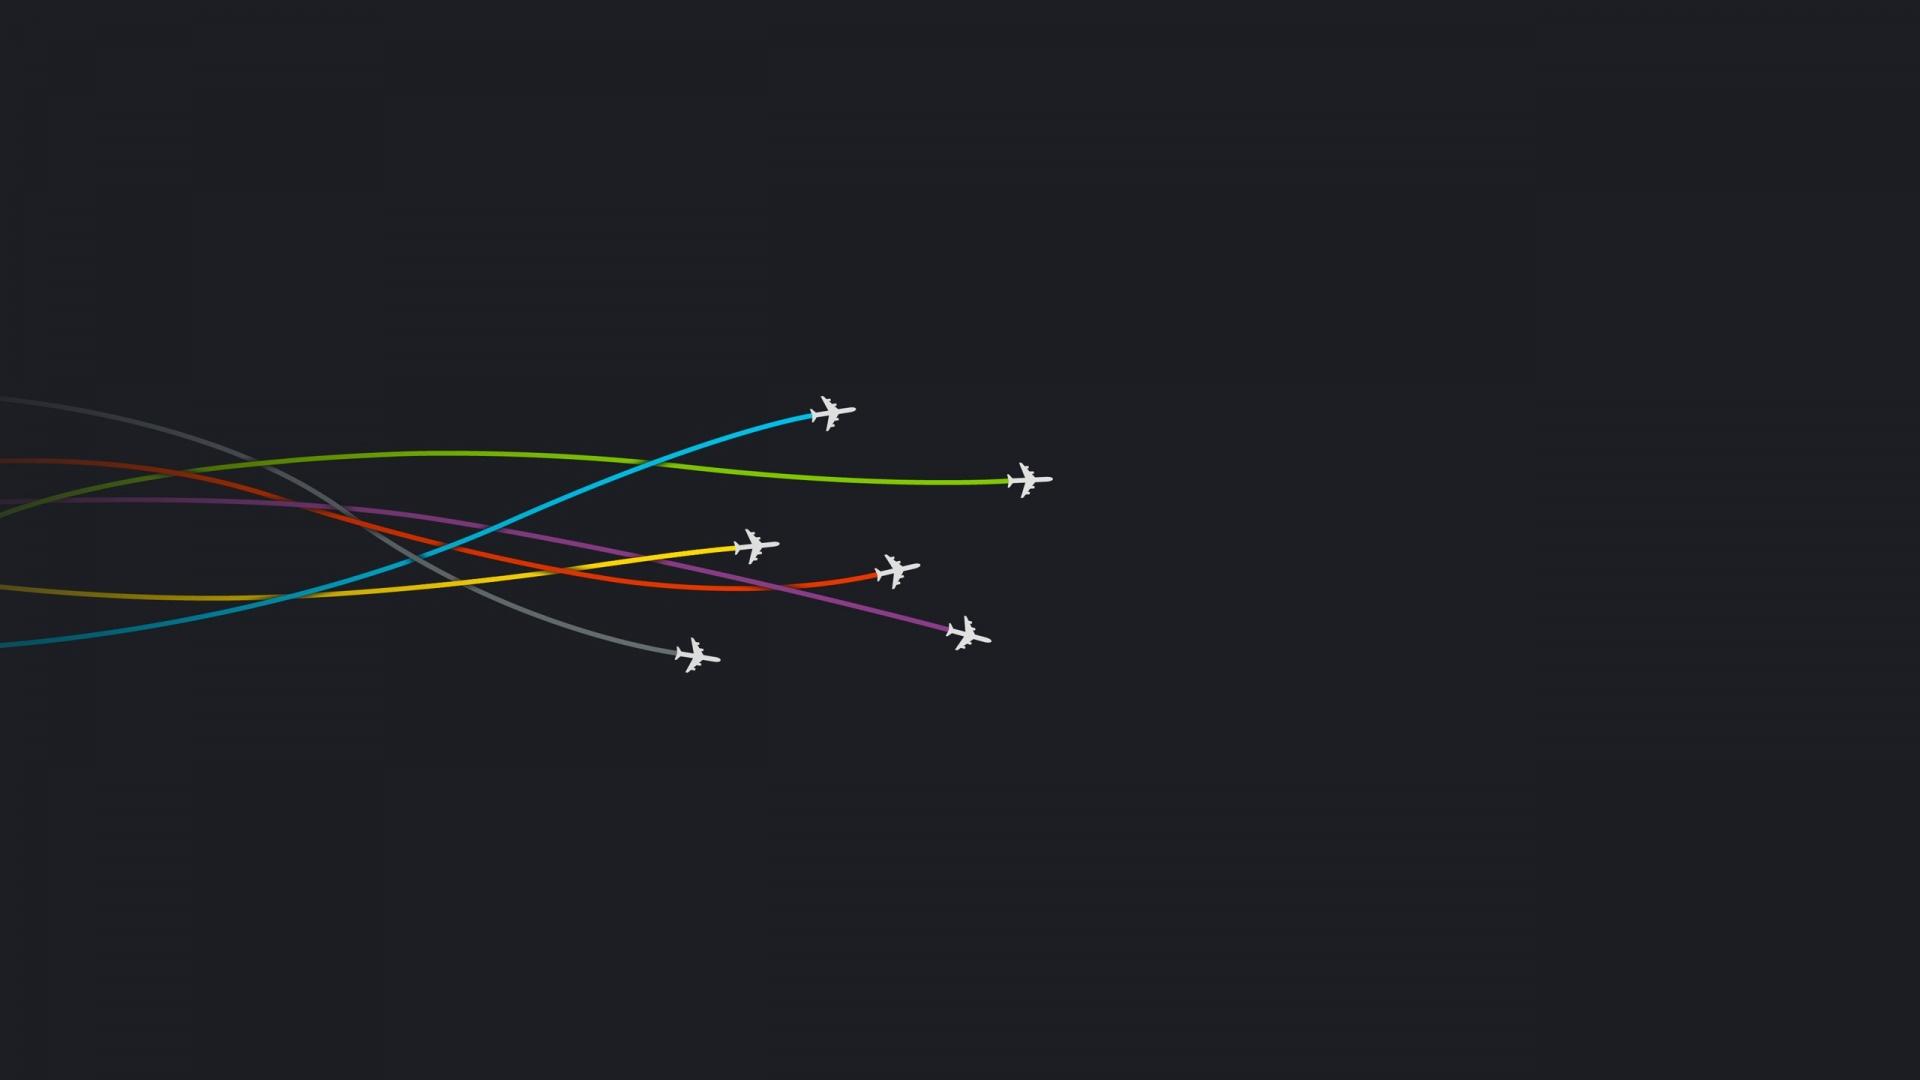 cool paper plane diagram elitech stc 1000 wiring dark backgrounds 1920x1080 | pixelstalk.net